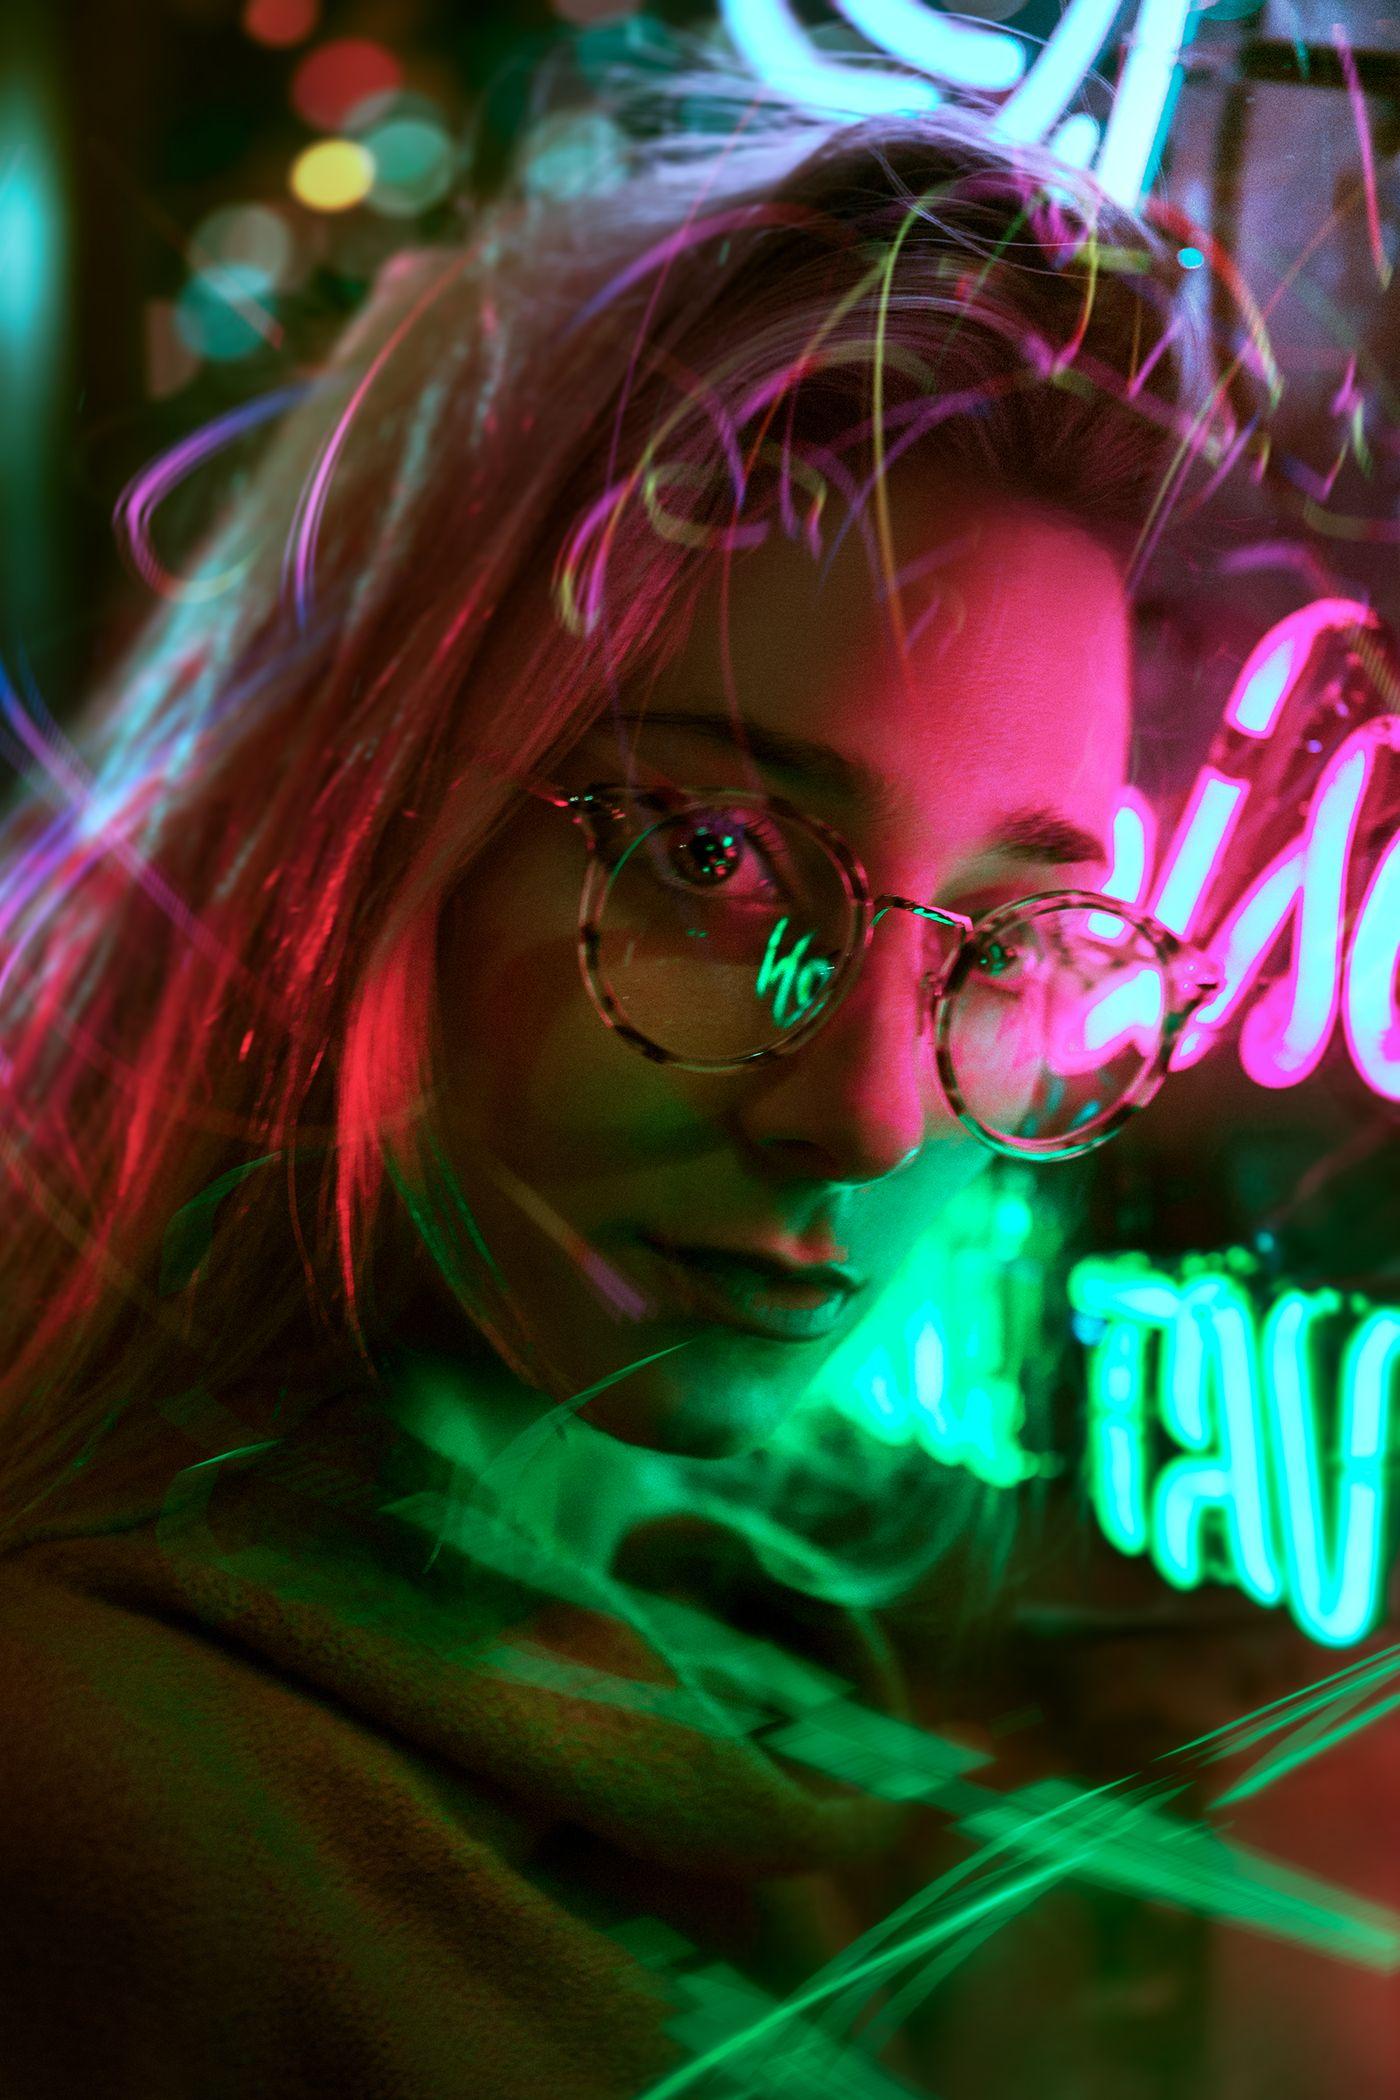 Neon Light Portrait On Behance: Neon Light Portrait On Behance